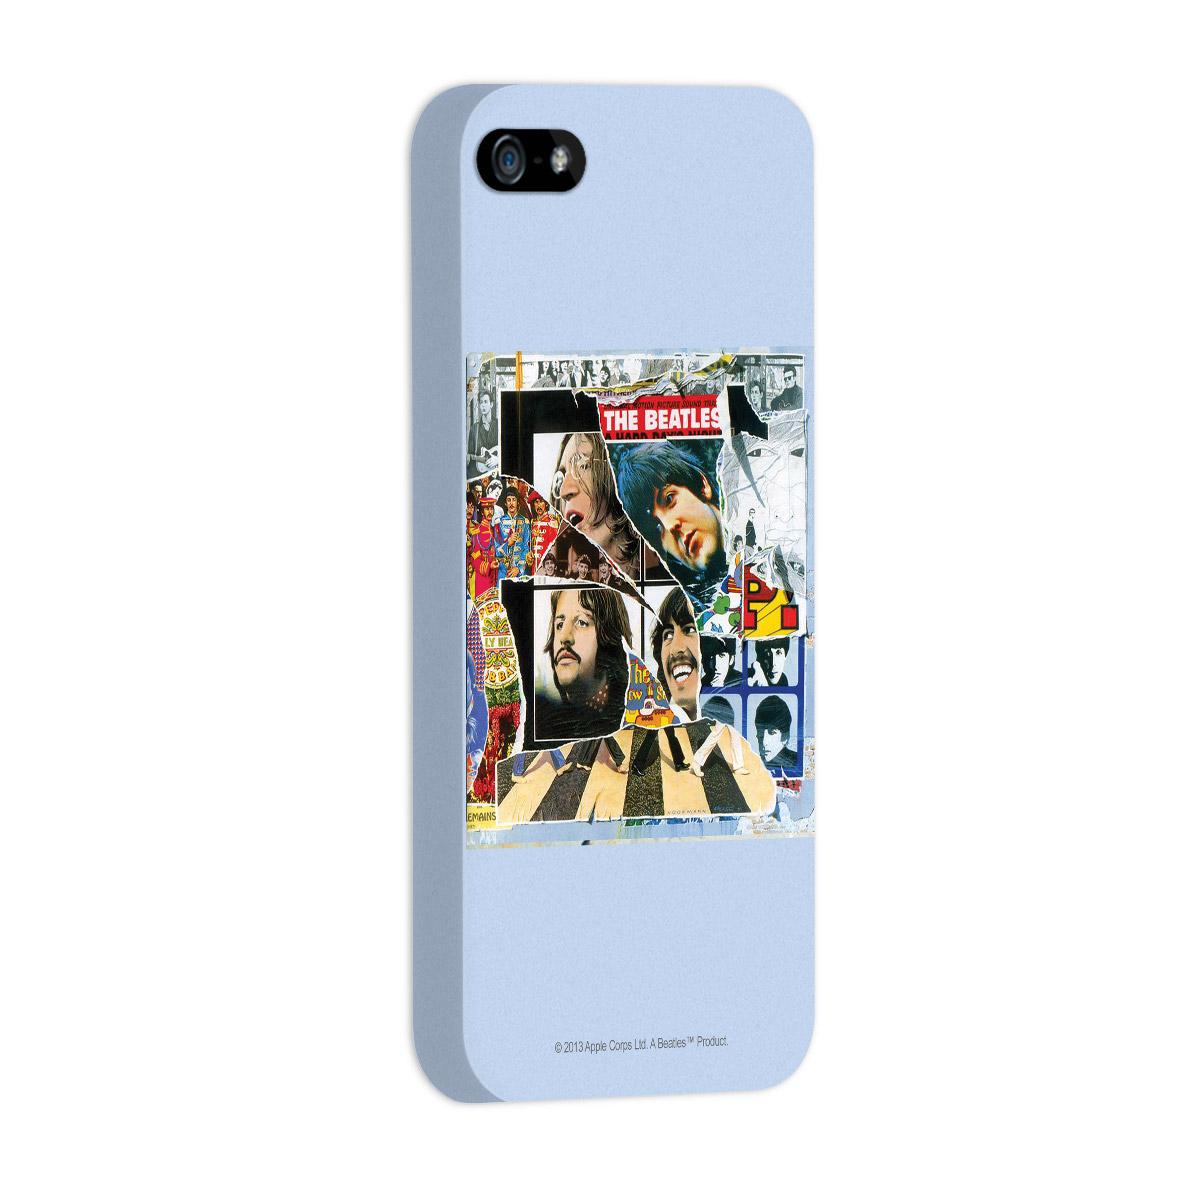 Capa de iPhone 5/5S The Beatles Anthology III